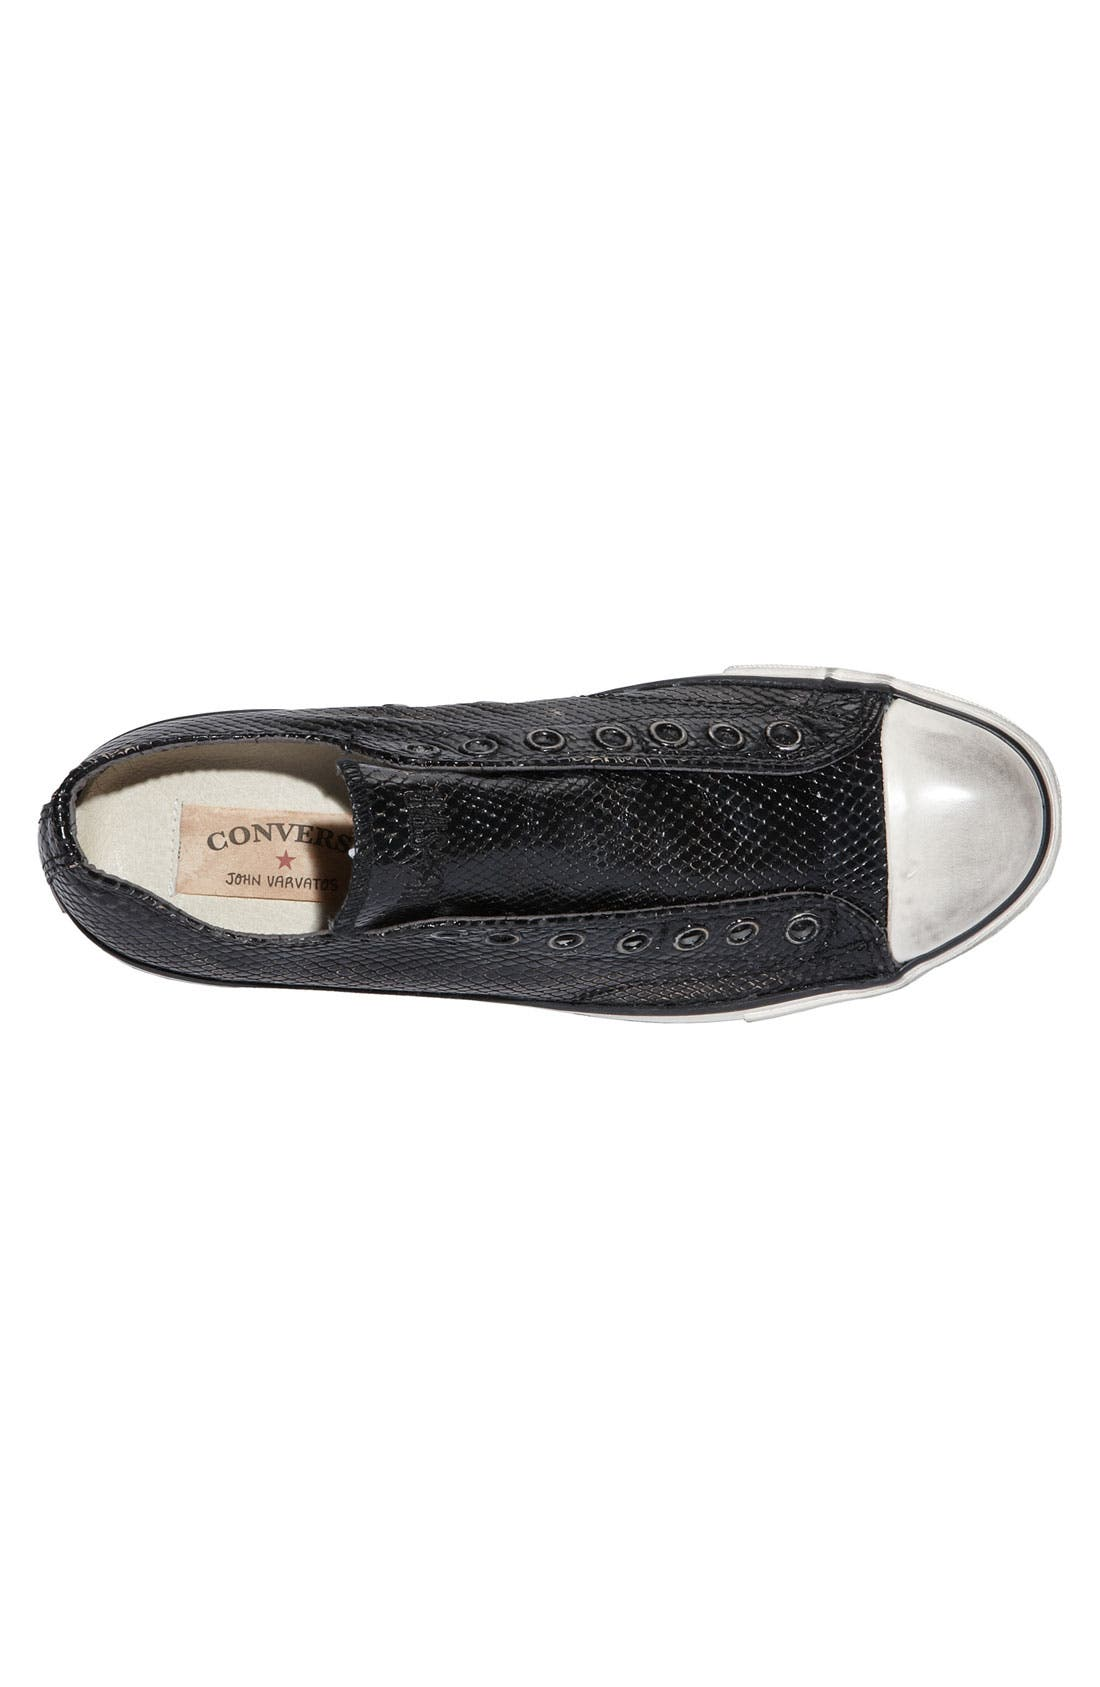 Alternate Image 2  - Converse Chuck Taylor® Textured Leather Slip-On